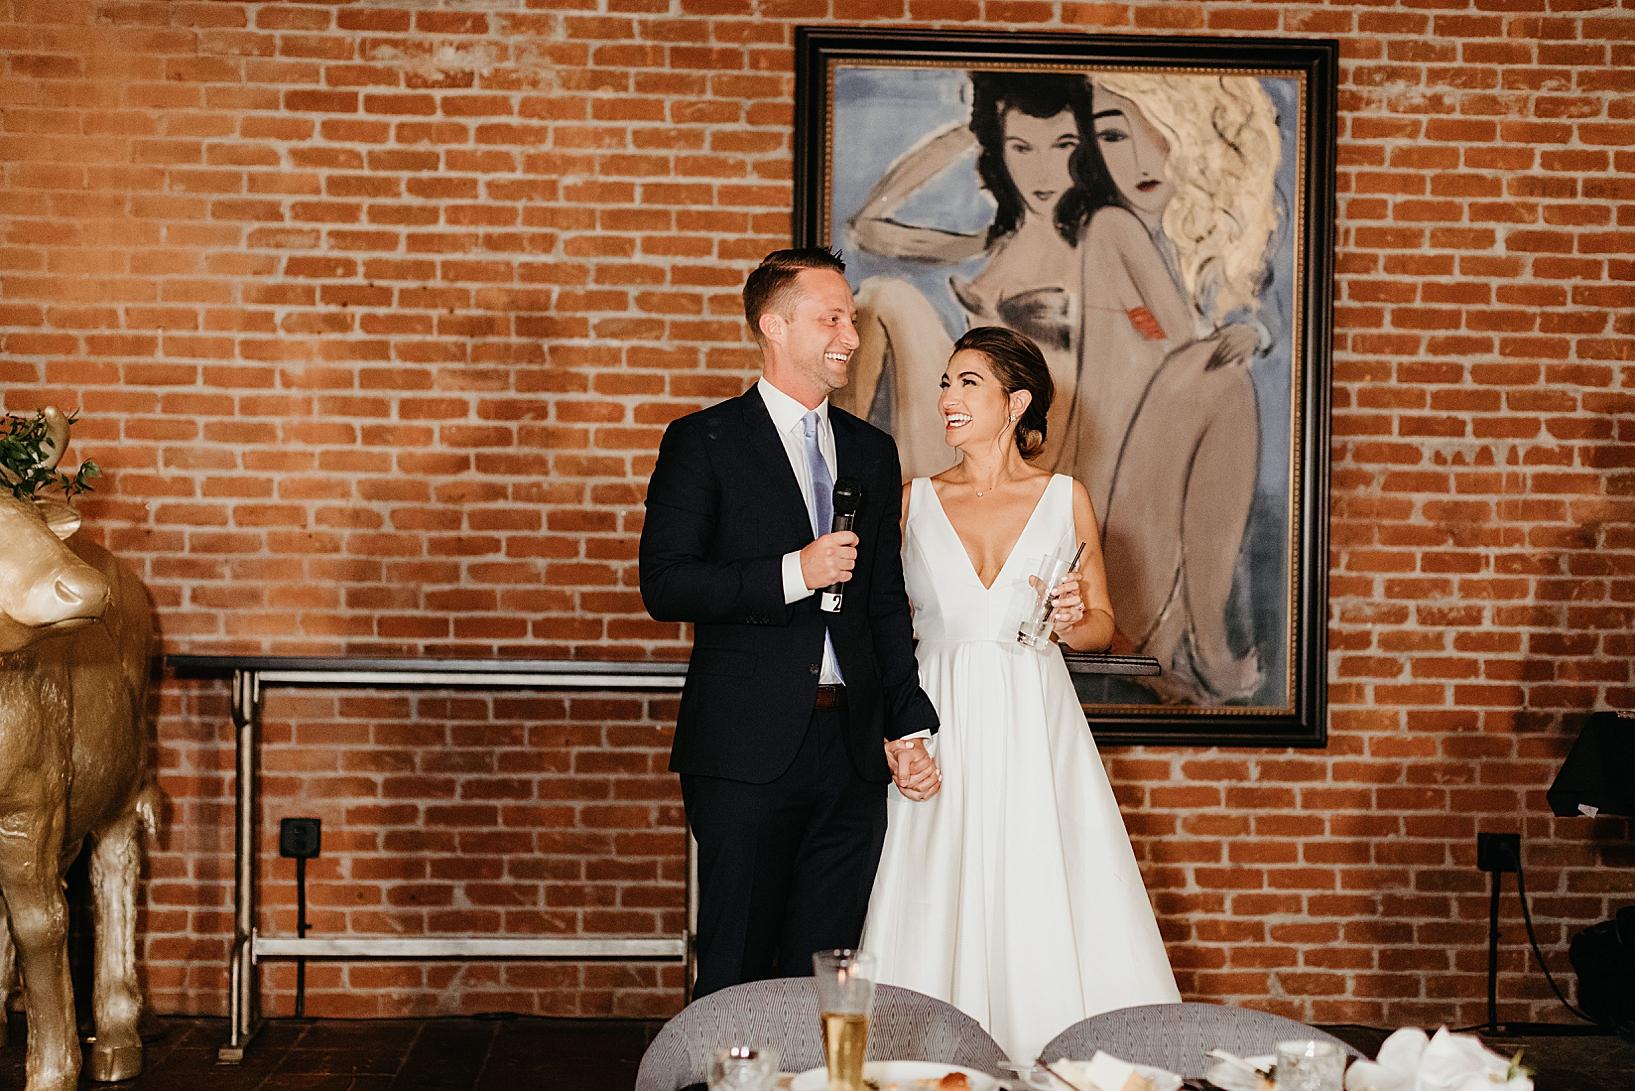 Herb-and-Wood-Wedding-103.jpg